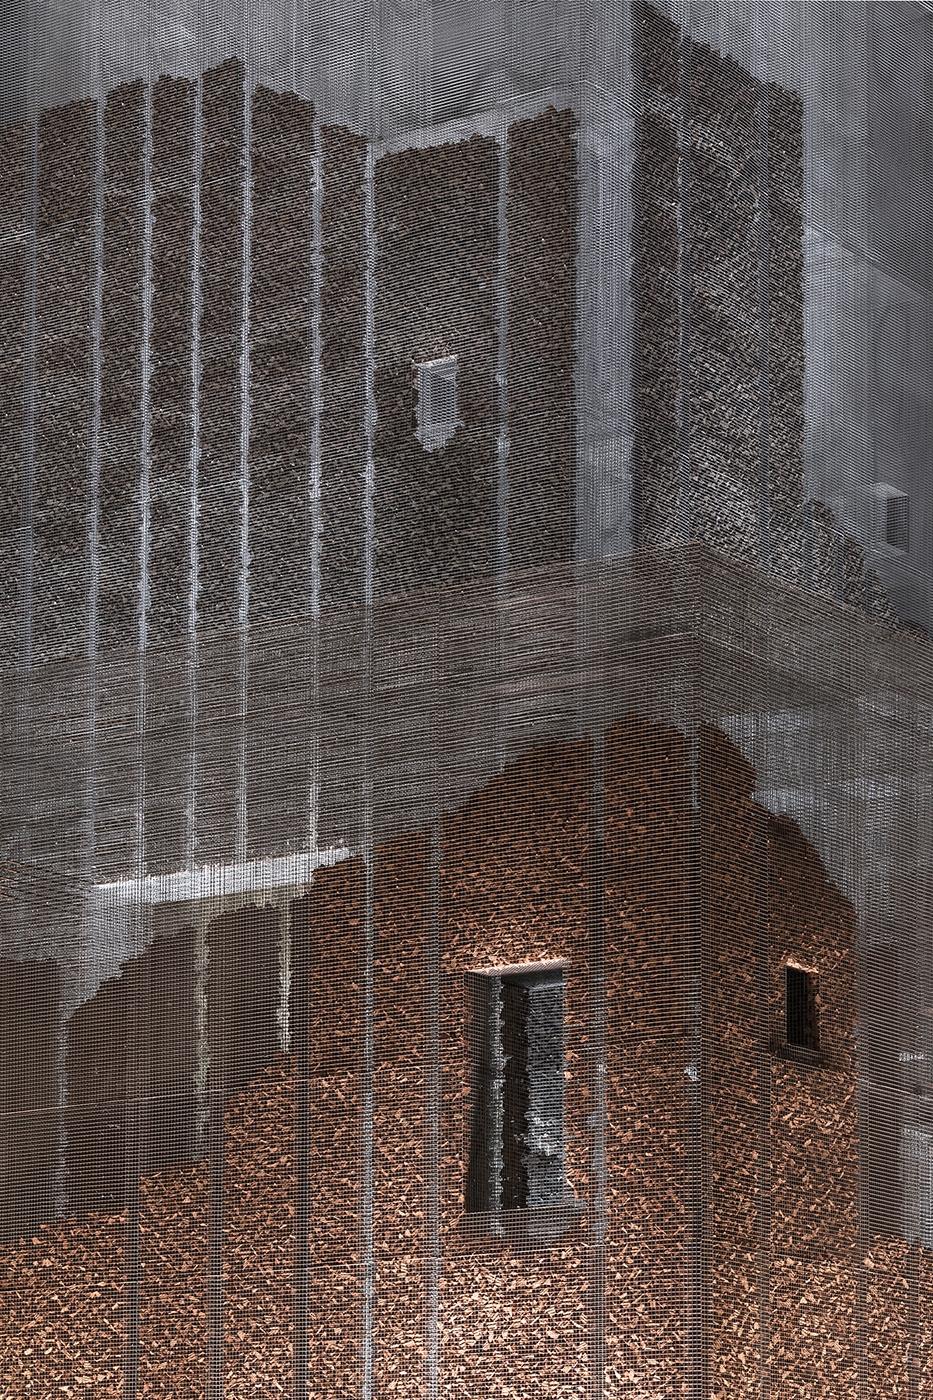 Studio Studio Studio Gharfa Edoardo Tresoldi detail Diriyah Oasis designed and curated by Designlab Experience © Roberto Conte